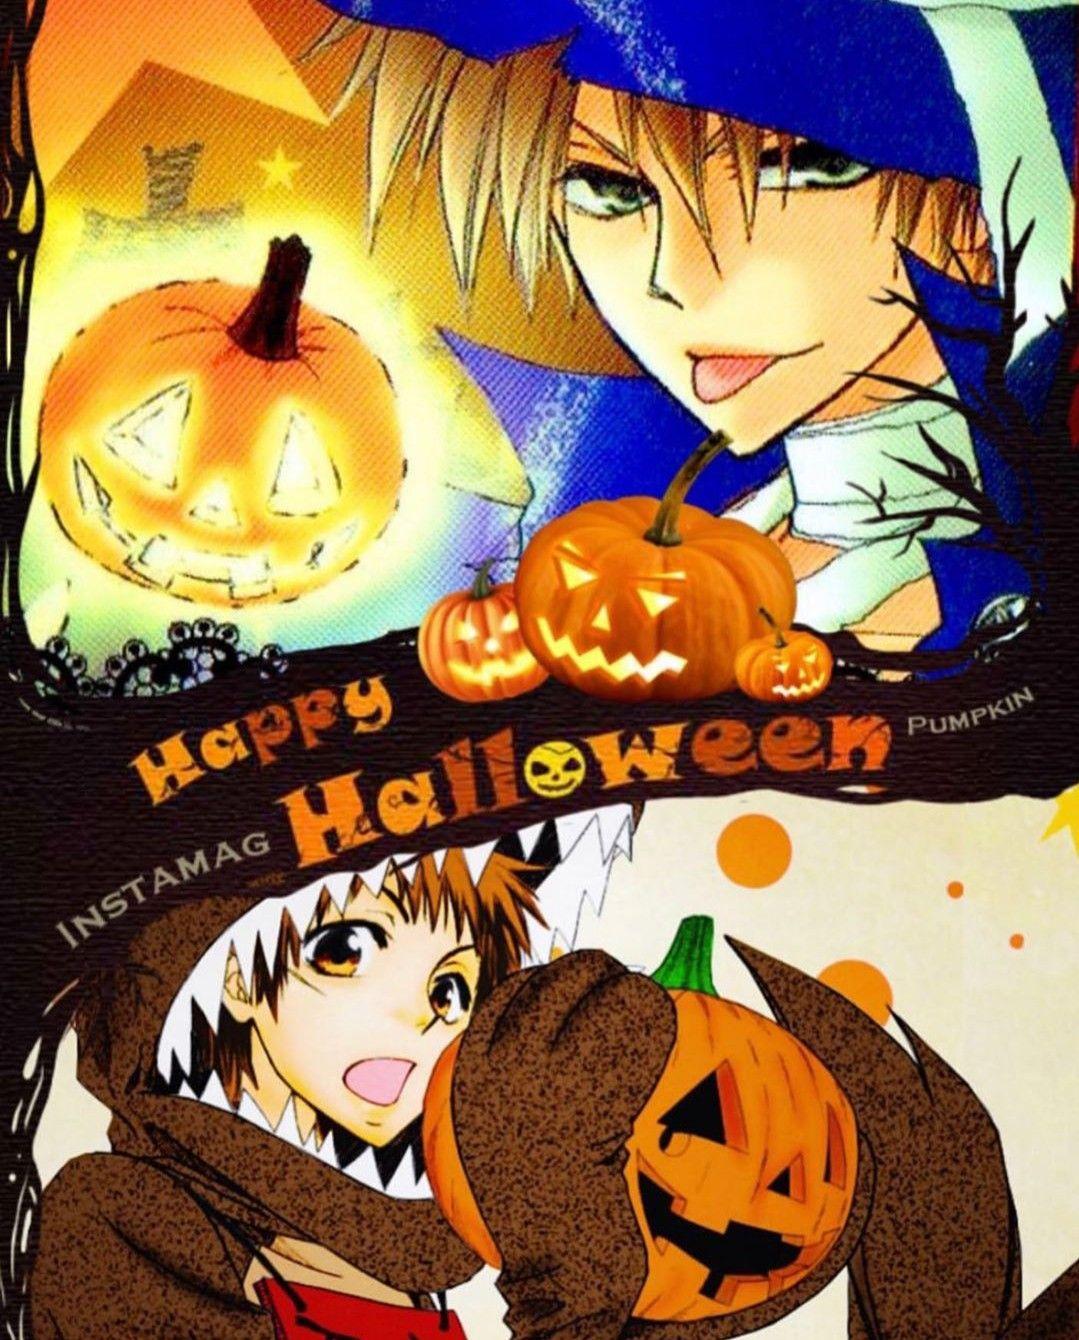 Pin by Sayali V on Kaichou wa maid sama Anime maid, Best